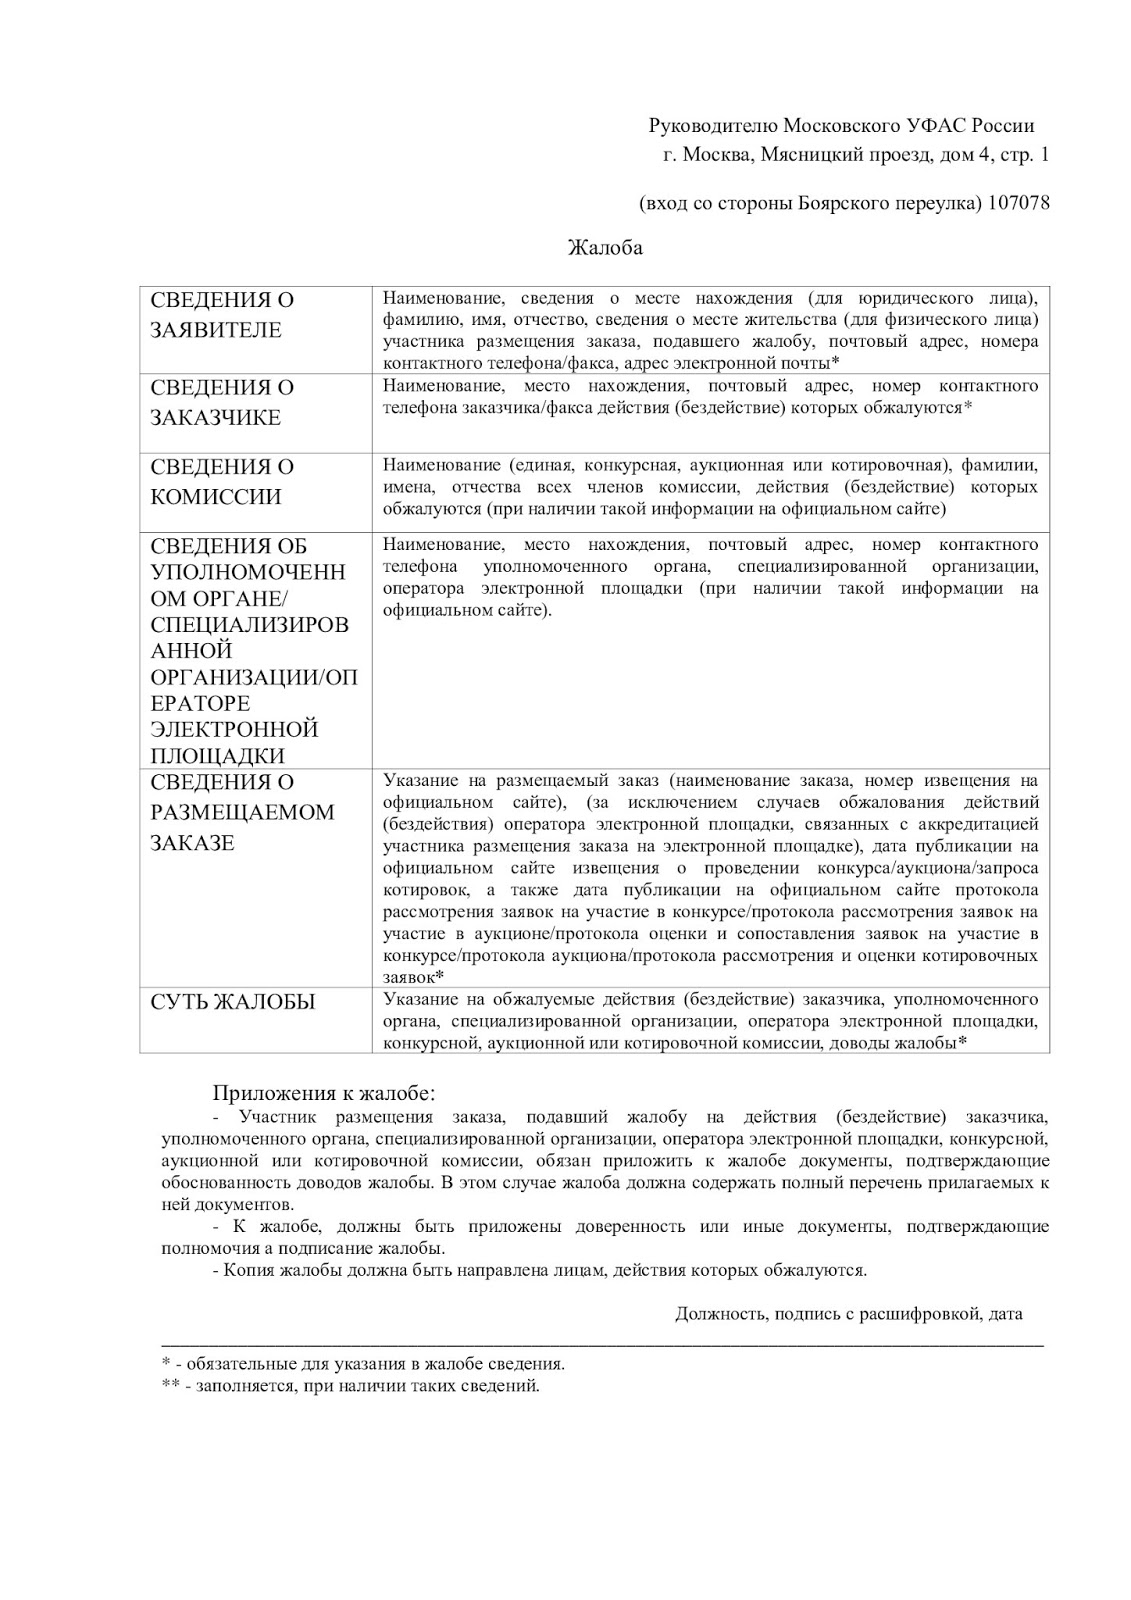 Жалоба в ФАС по 44-ФЗ (Образец жалобы на заказчика)